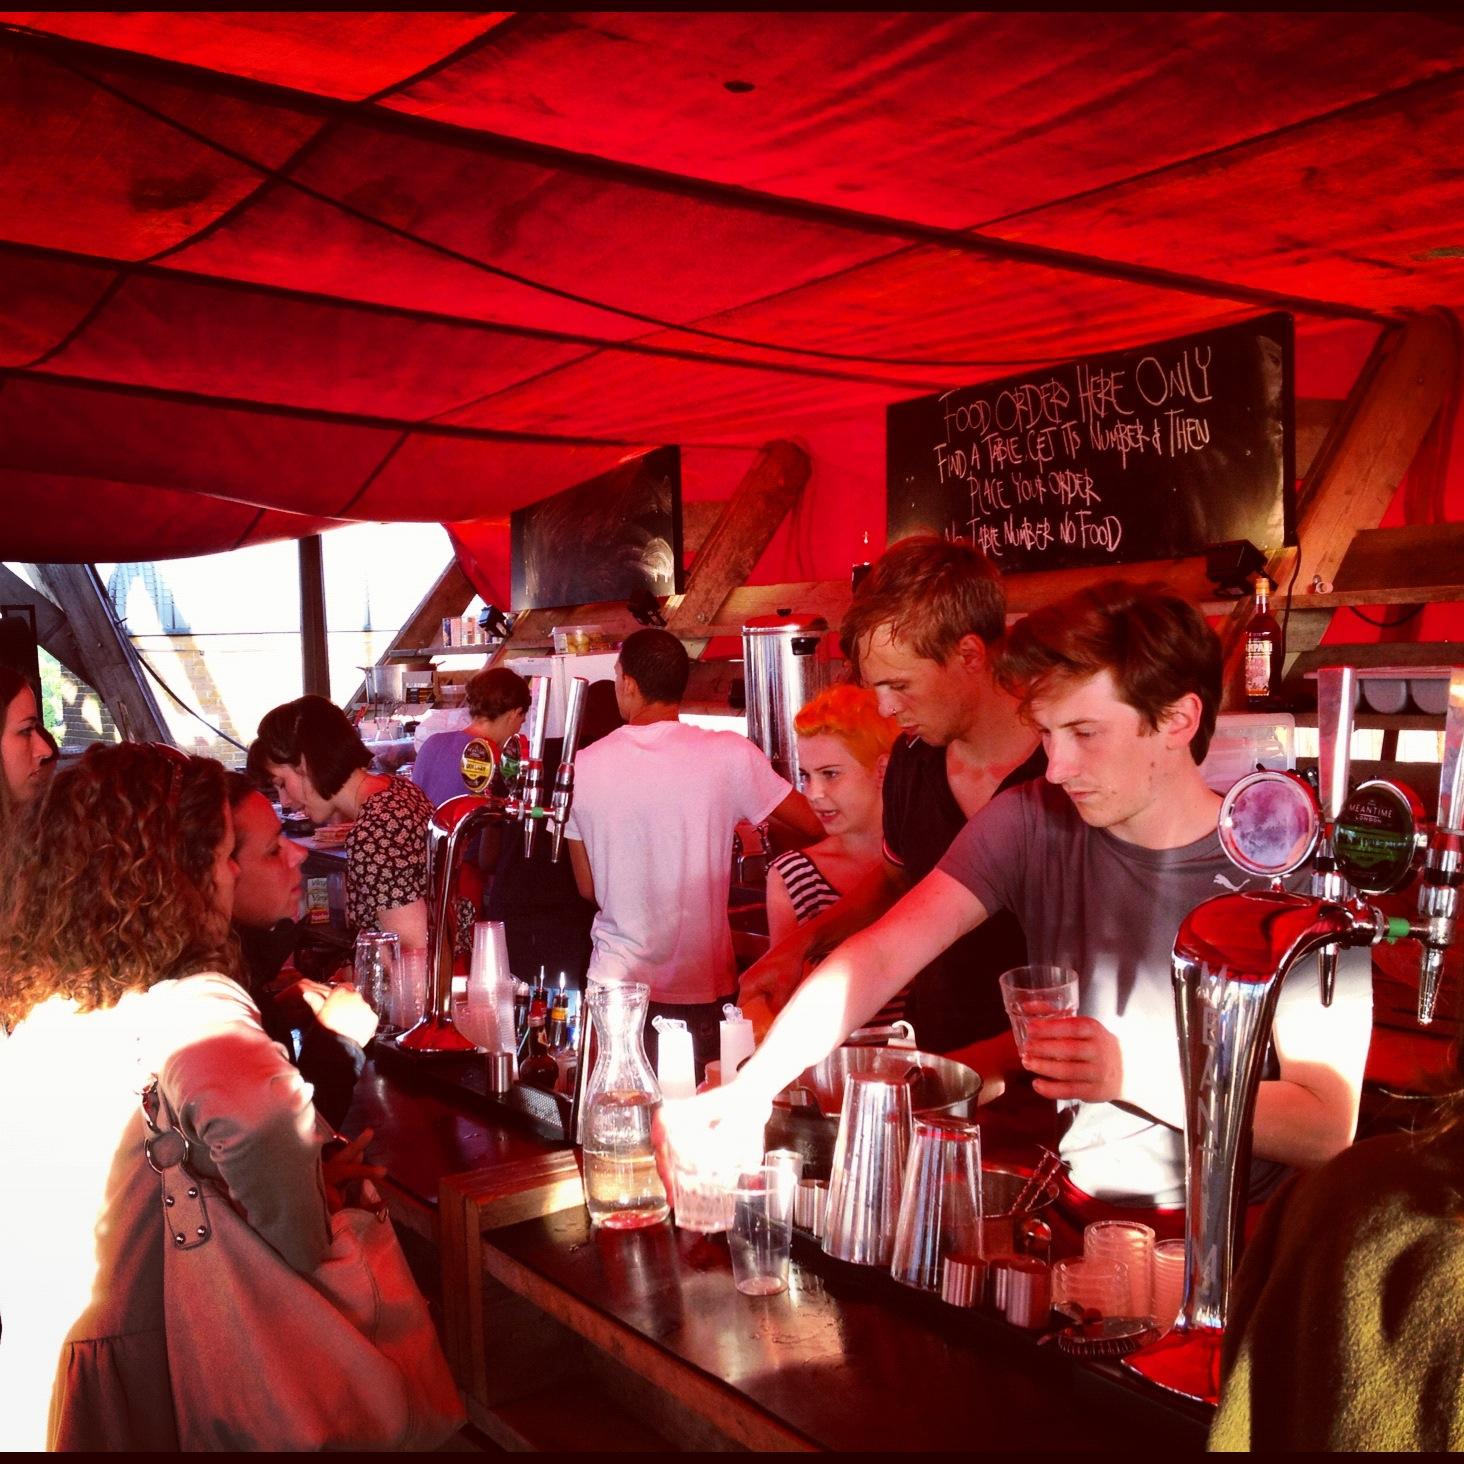 Frank S Cafe And Campari Bar London